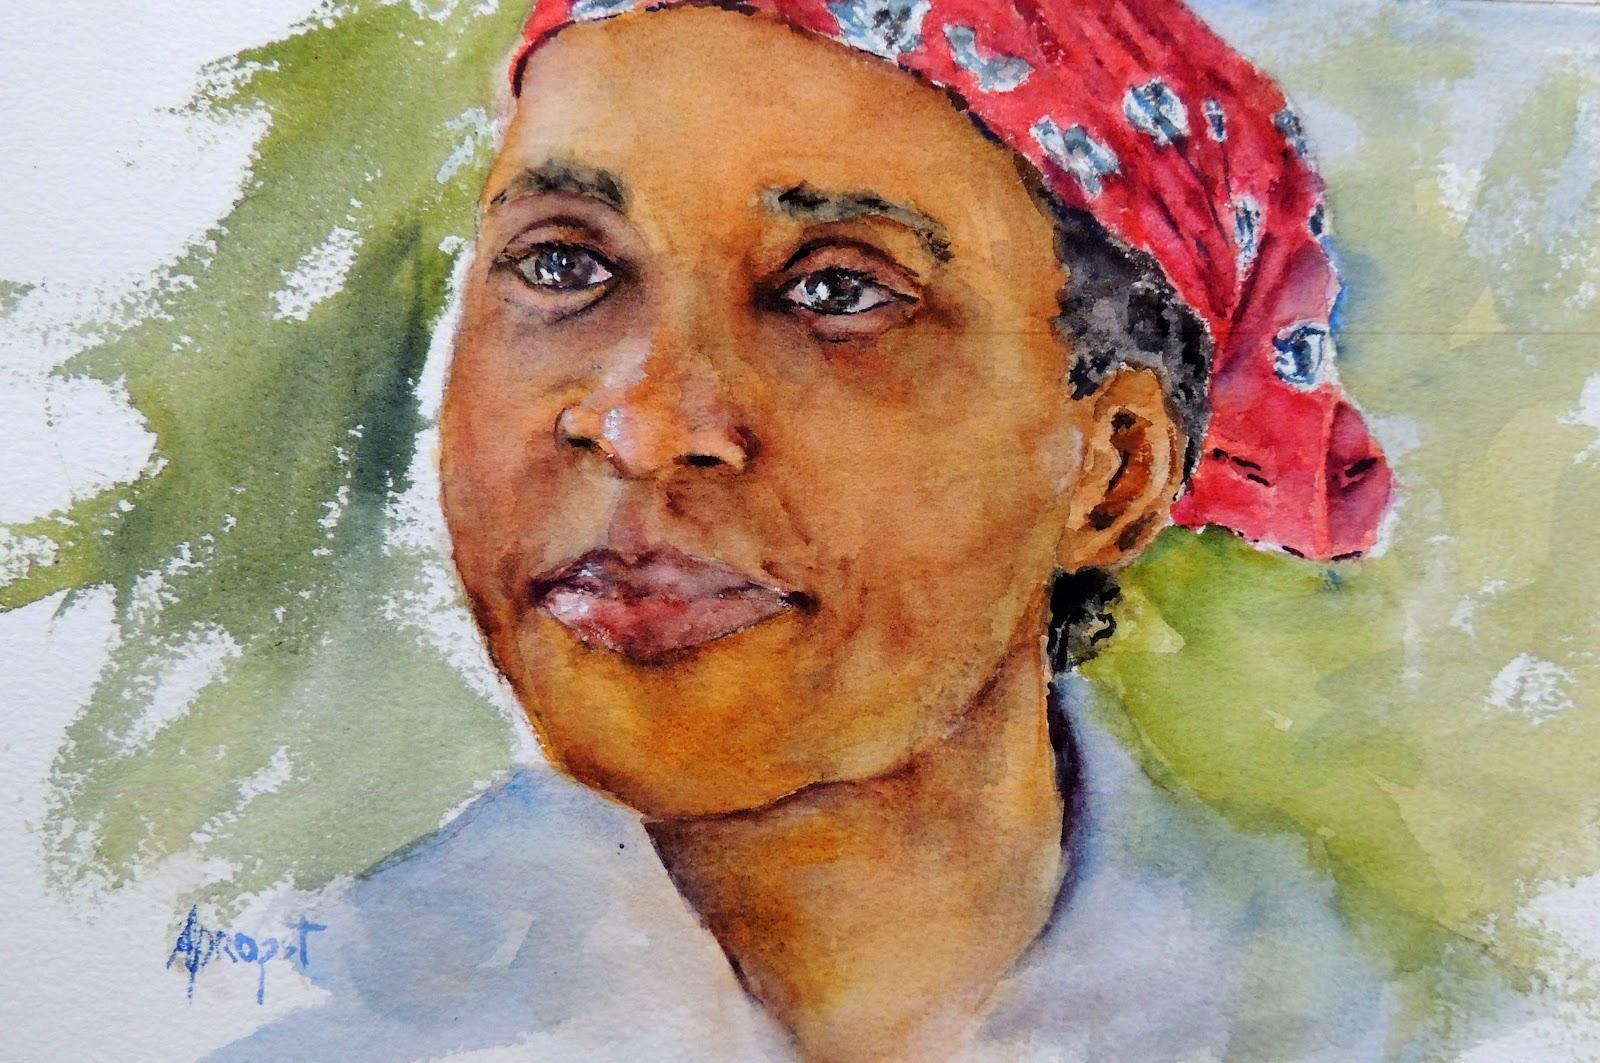 Watercolor artists names - Watercolor Artists Names 47